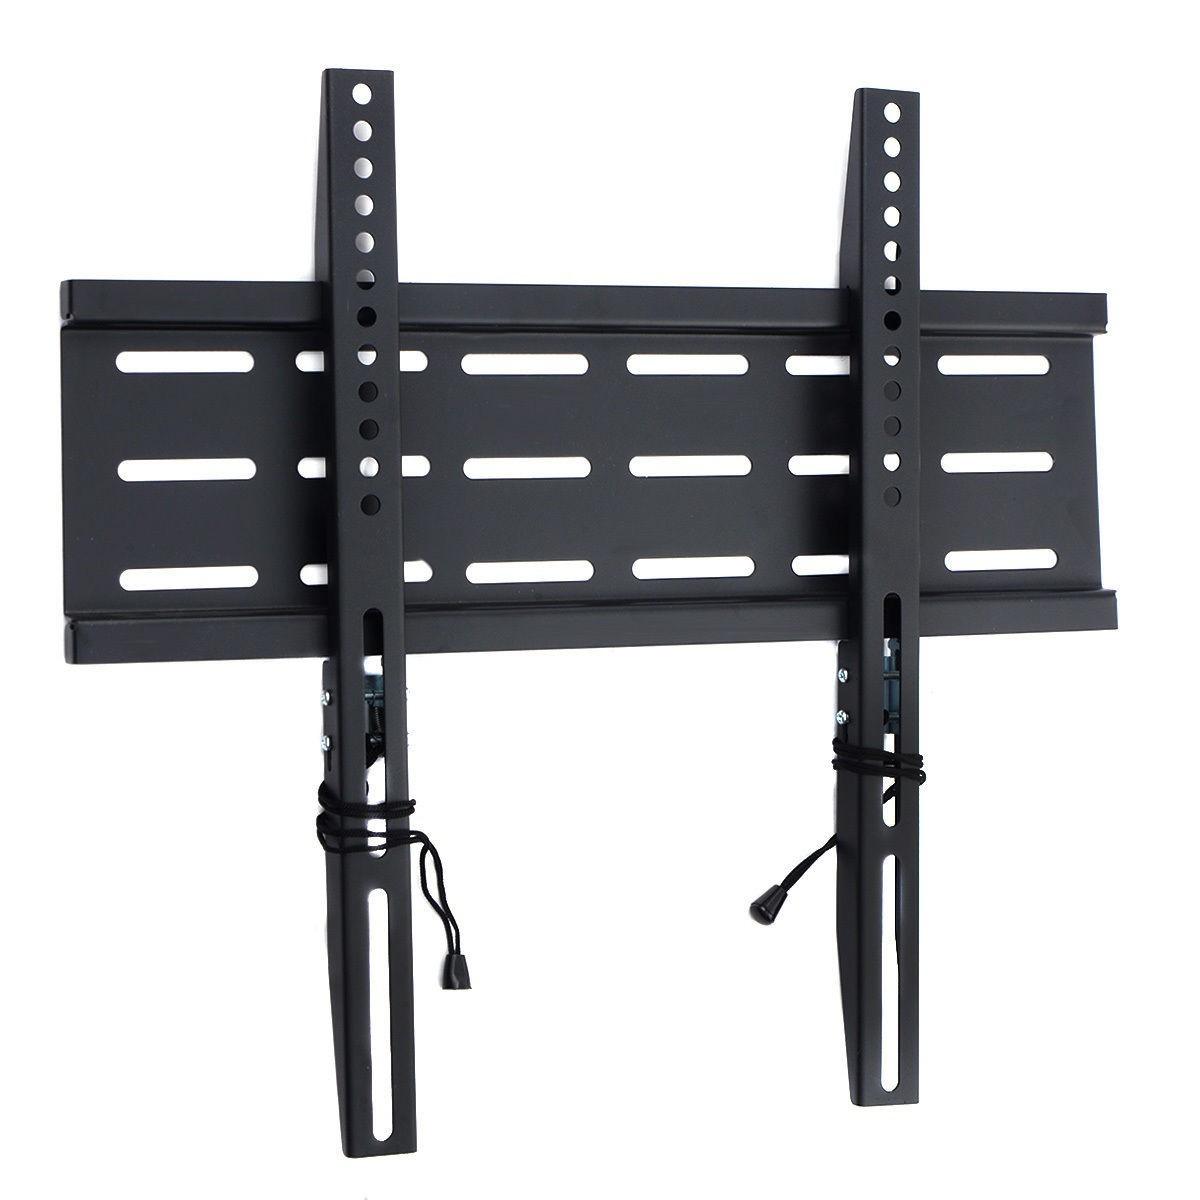 lcd led plasma flat fixed tv wall mount bracket 26 32 37 40 42 46 50 55 60 inch. Black Bedroom Furniture Sets. Home Design Ideas